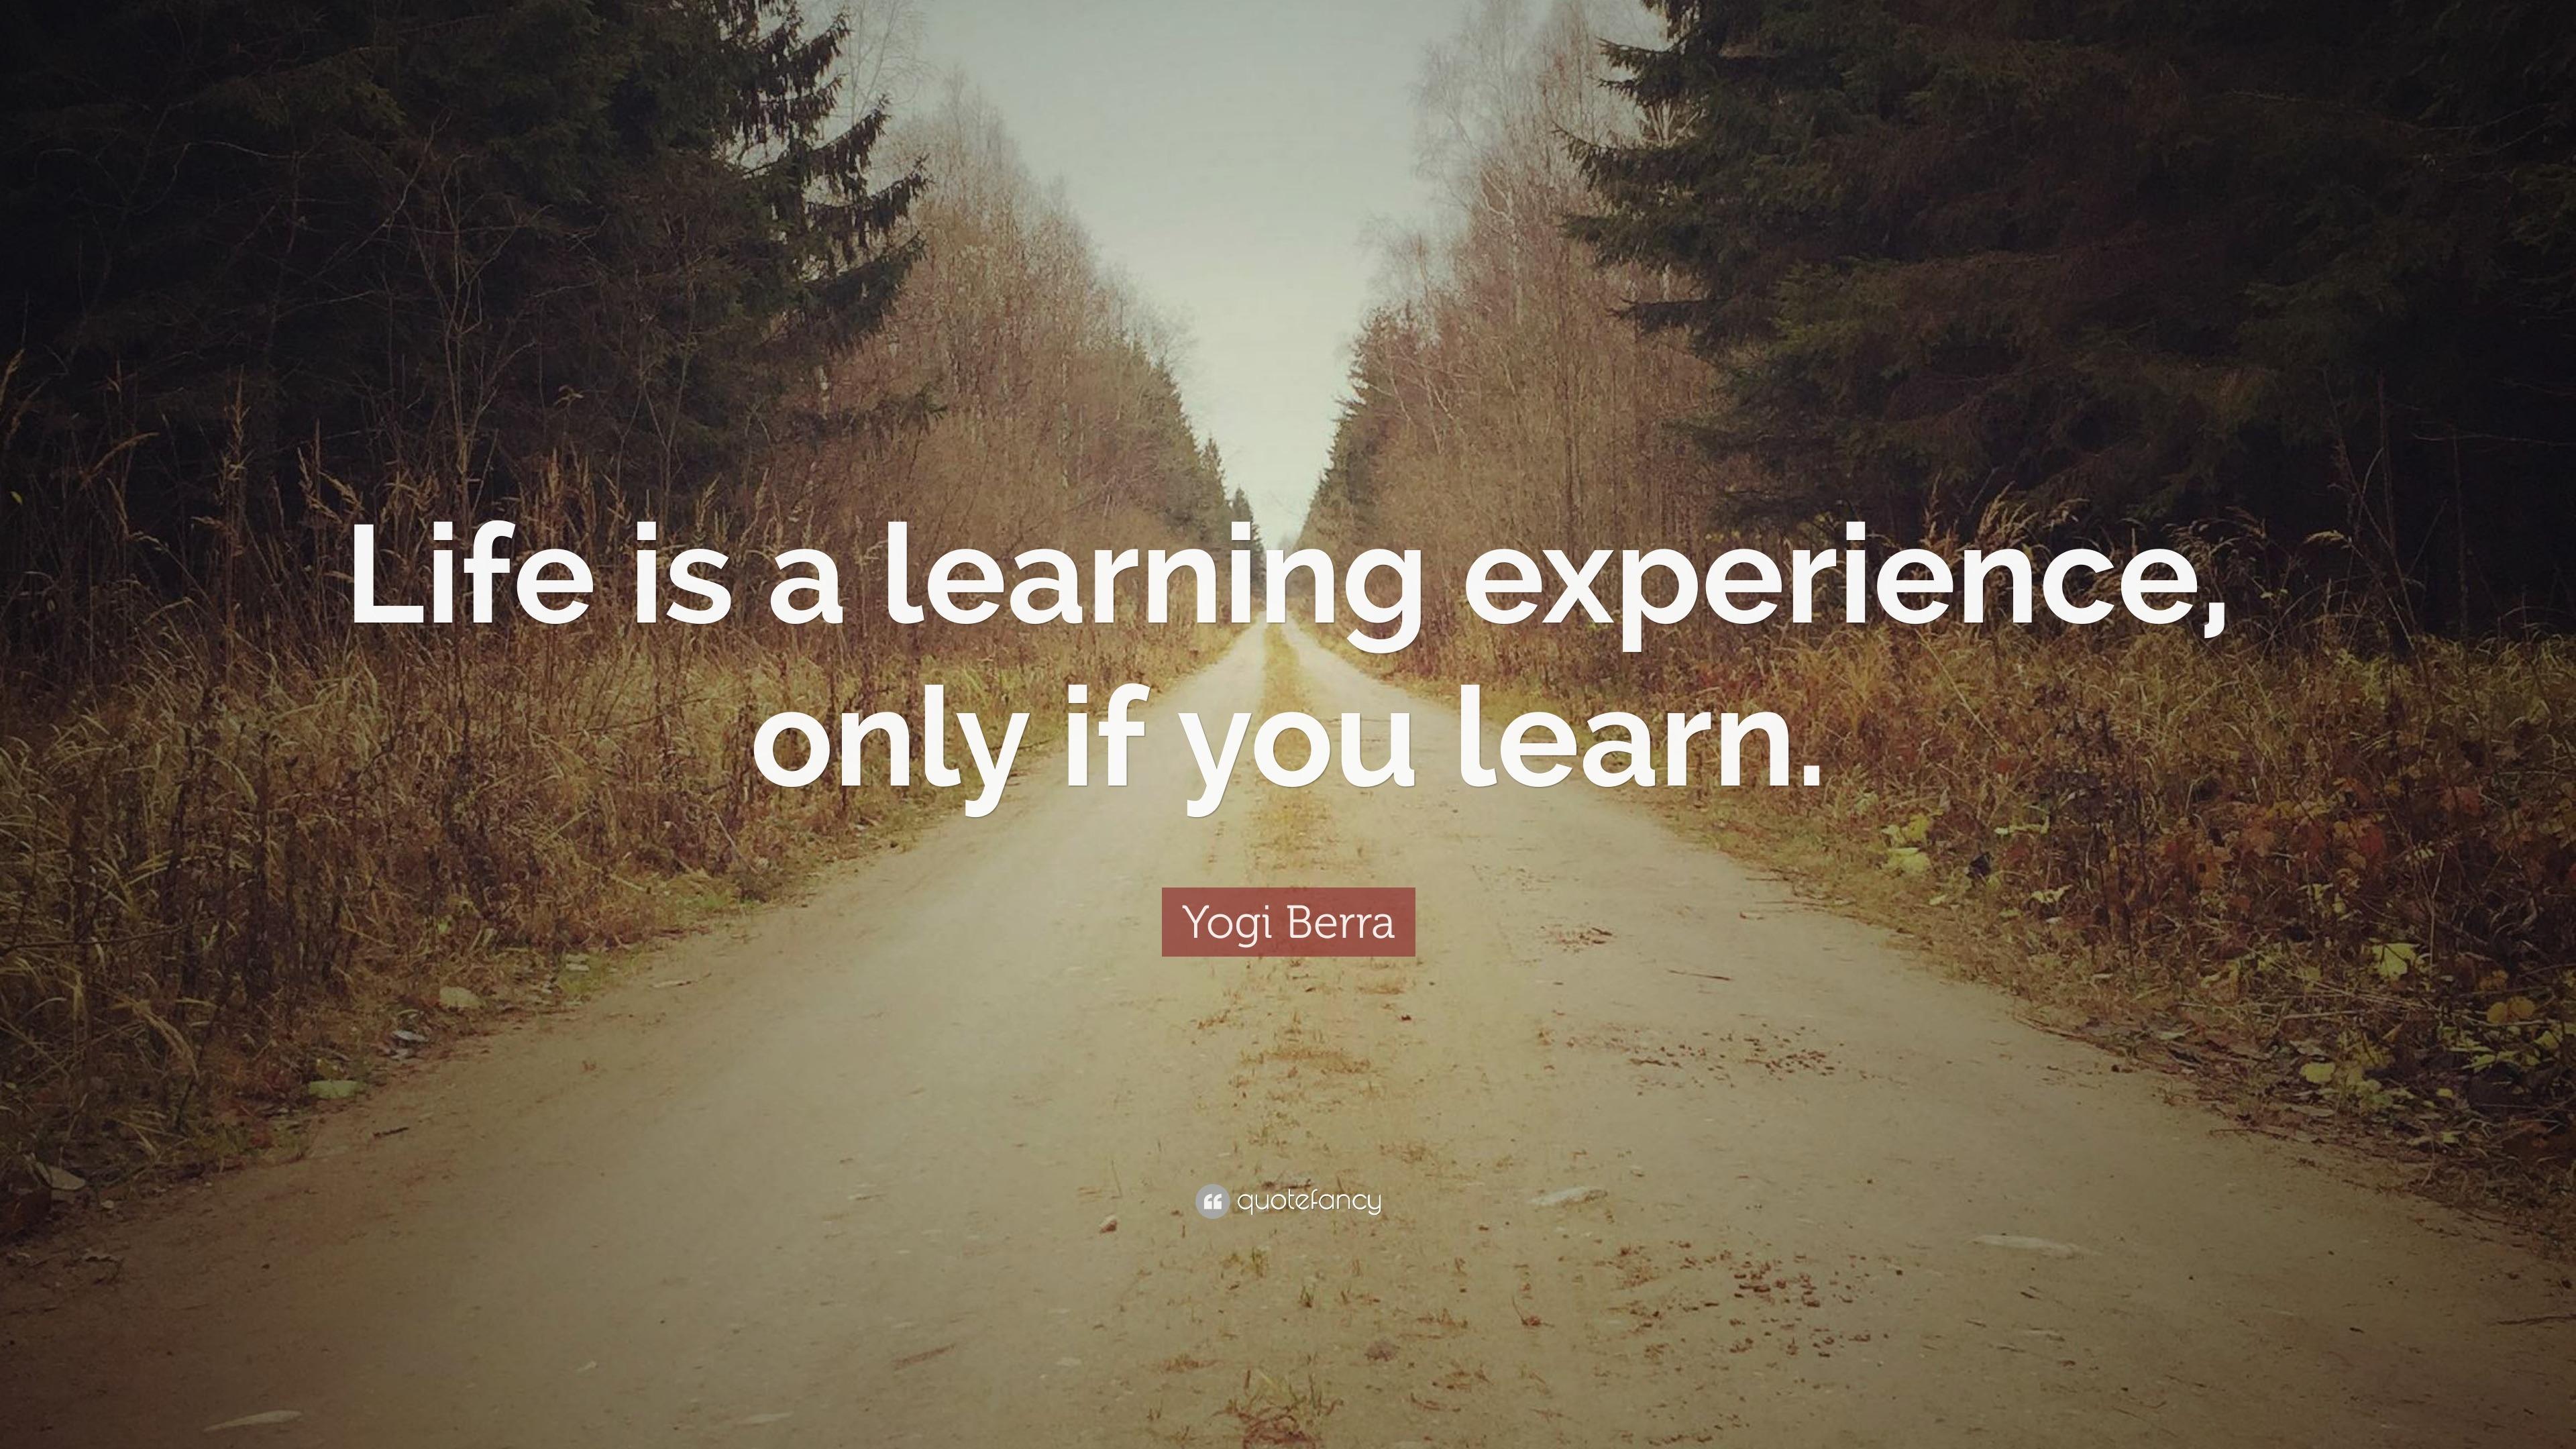 Yogi Berra Quotes (100 wallpapers) - Quotefancy